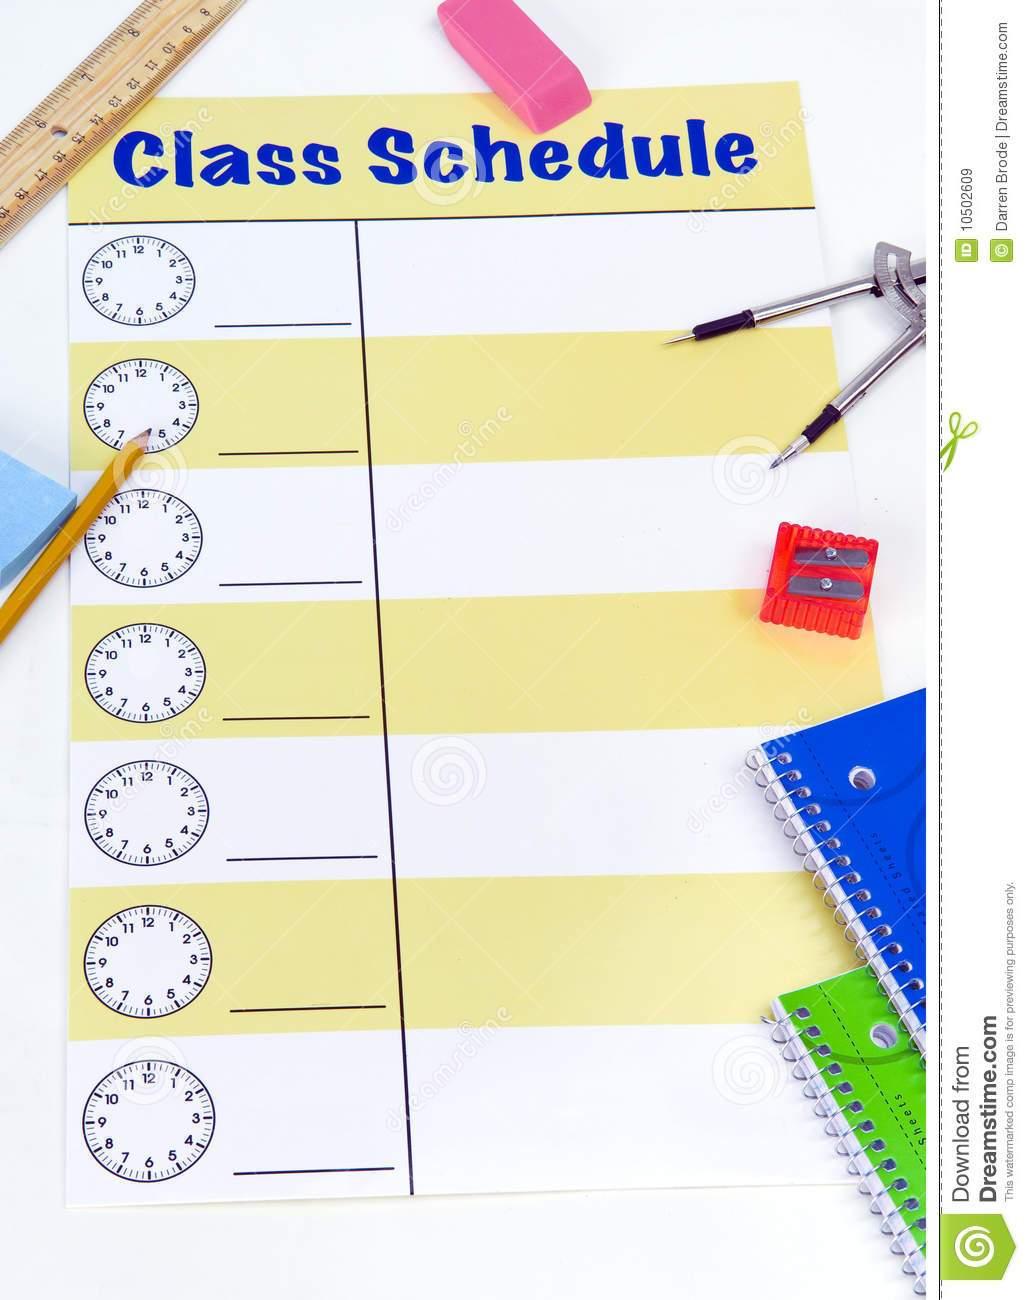 Class schedule clipart 3 » Clipart Portal.